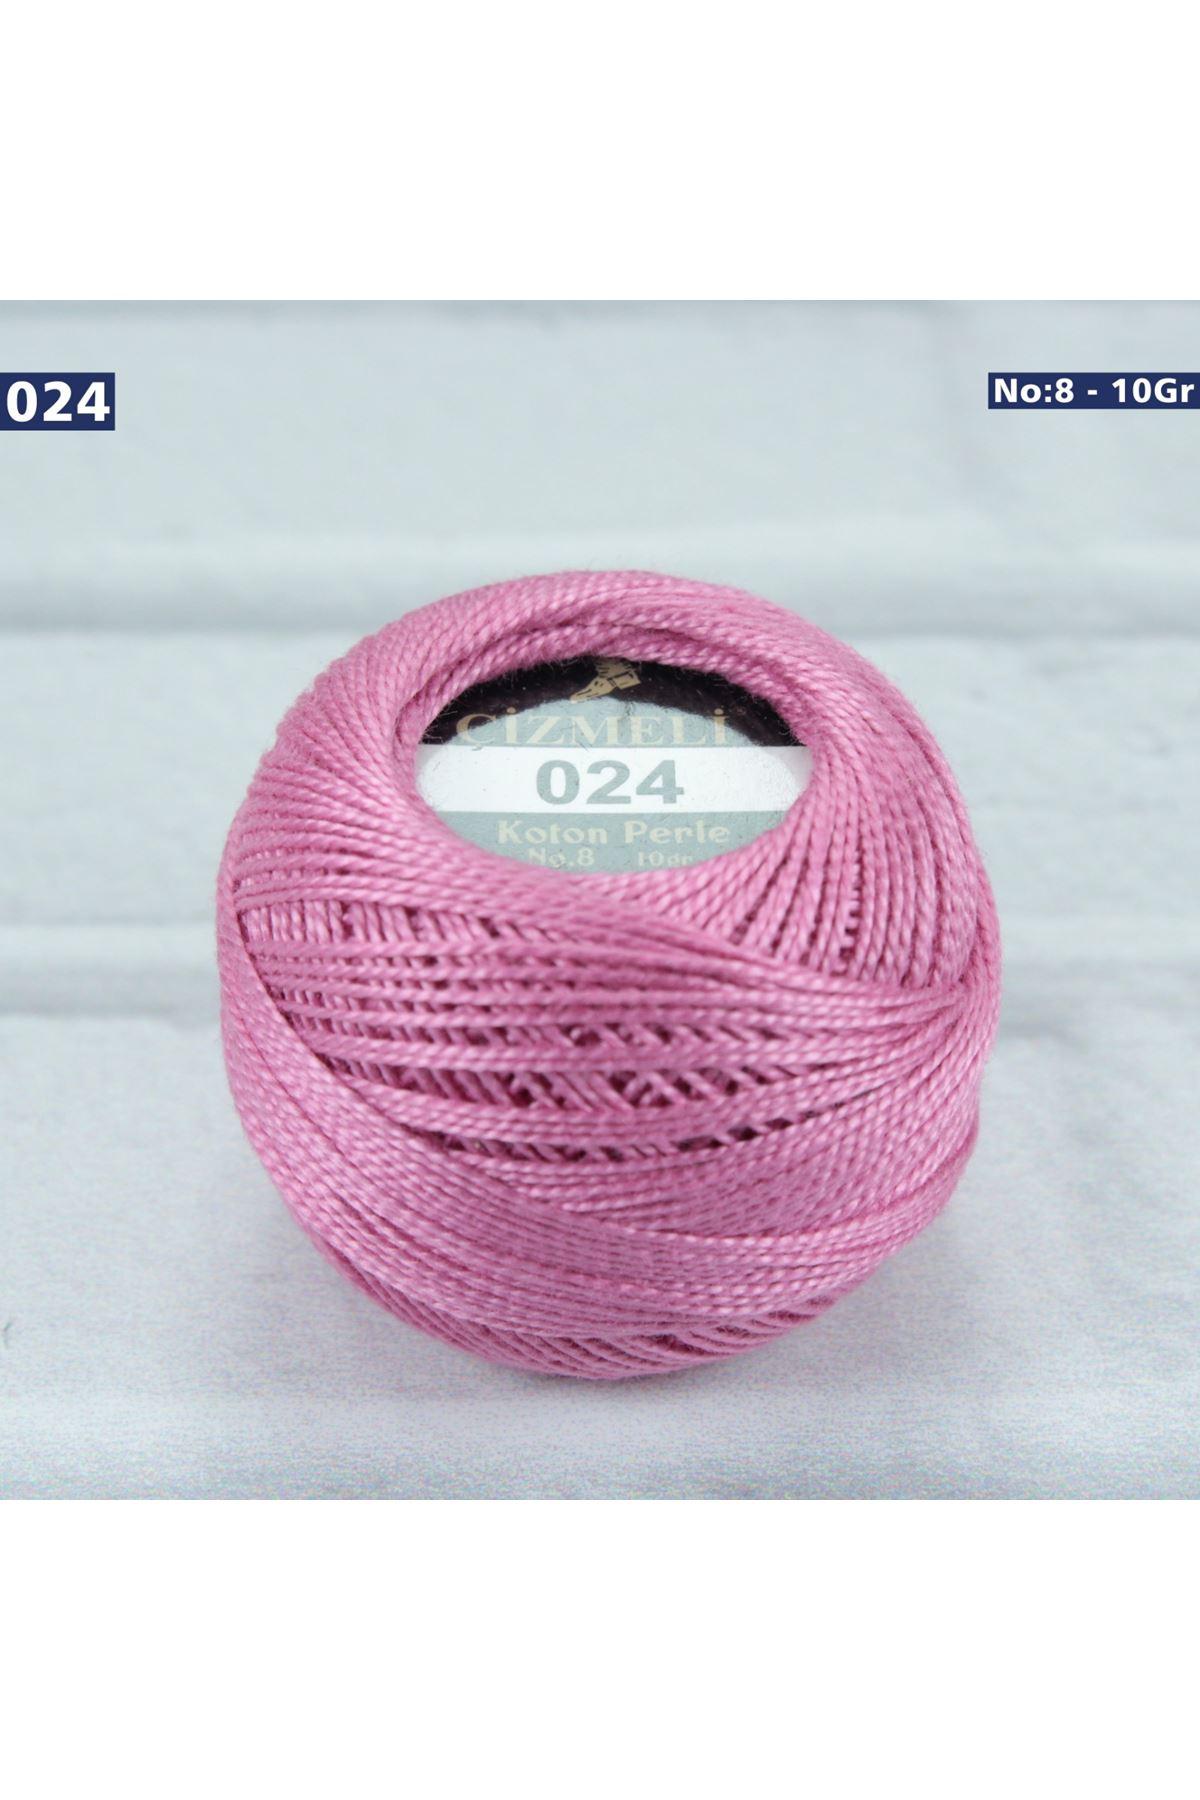 Çizmeli Cotton Perle Nakış İpliği No: 024